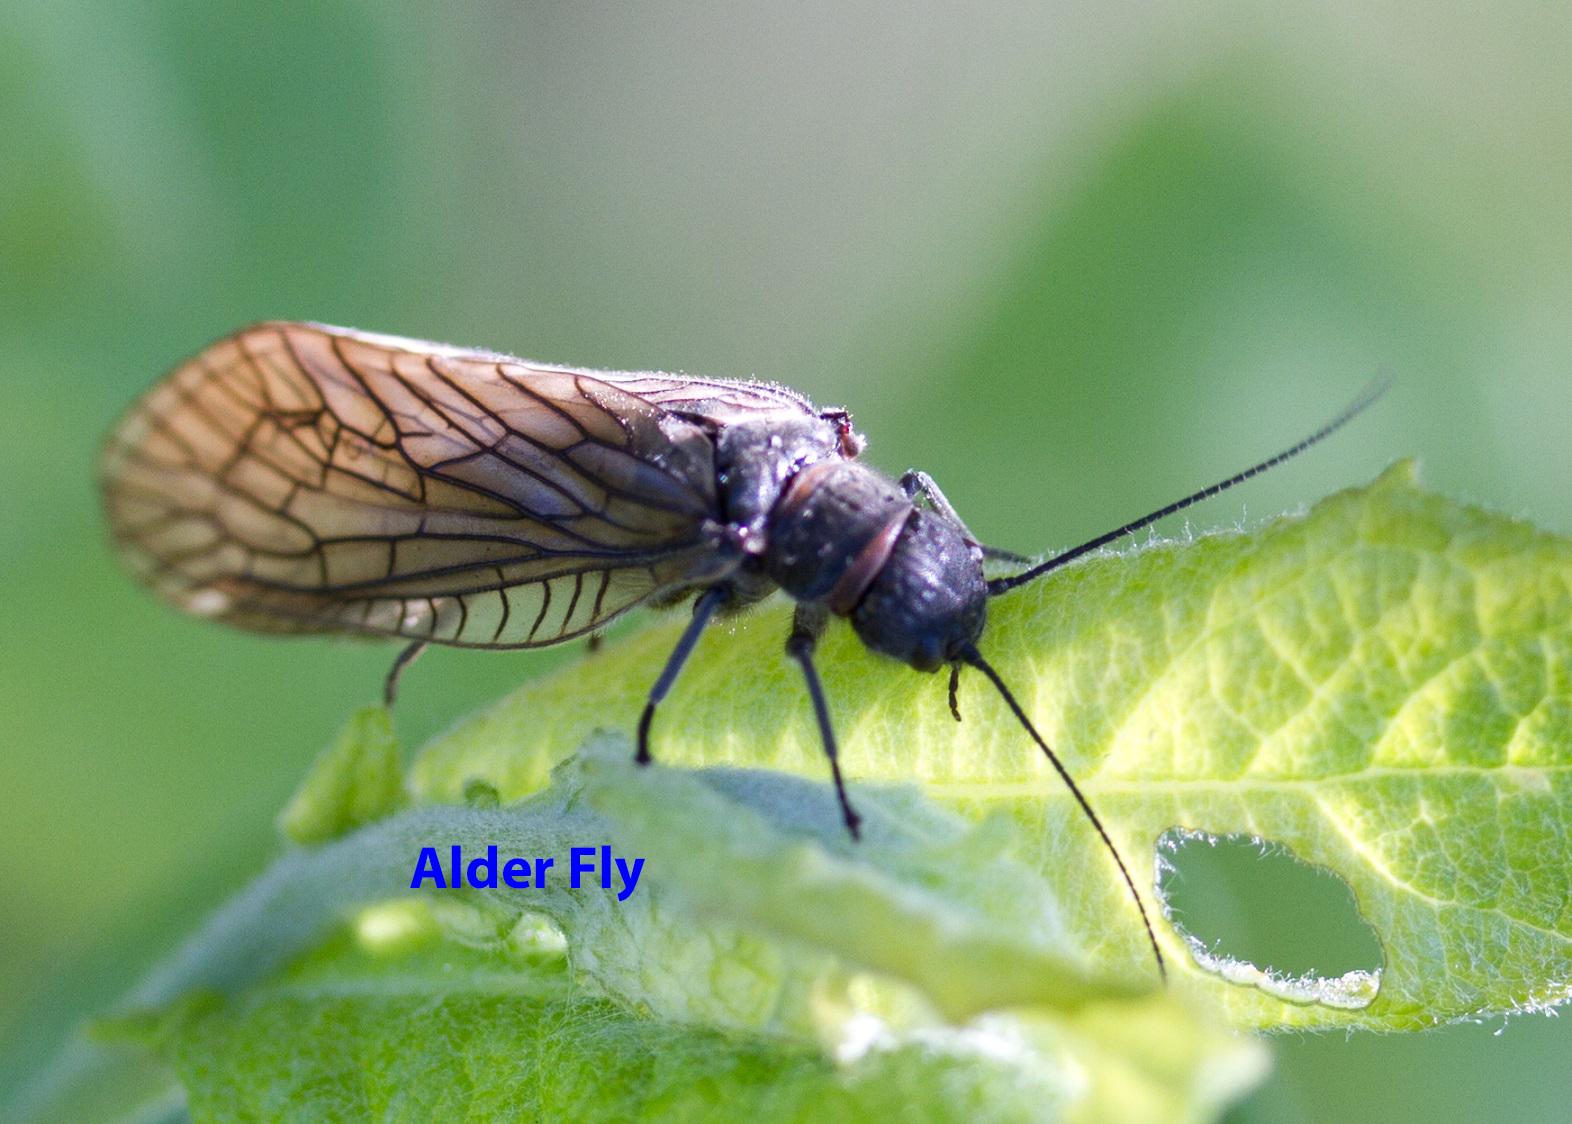 010-alder-fly-1-1-9ad90d445ffe697c81c56664001426f6cb4f89c1